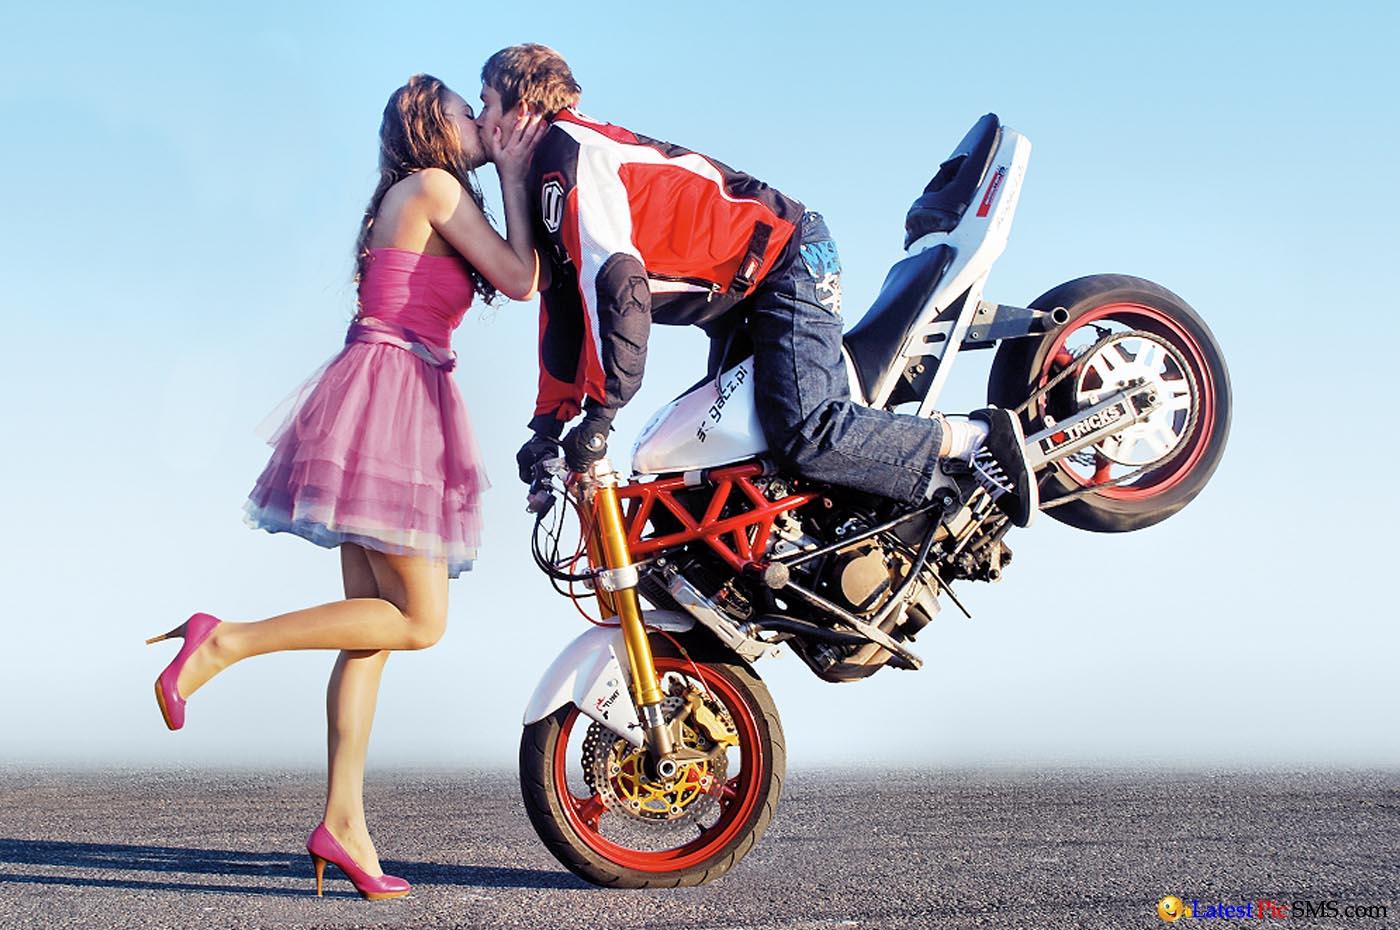 Beautiful Kissing scene on bike